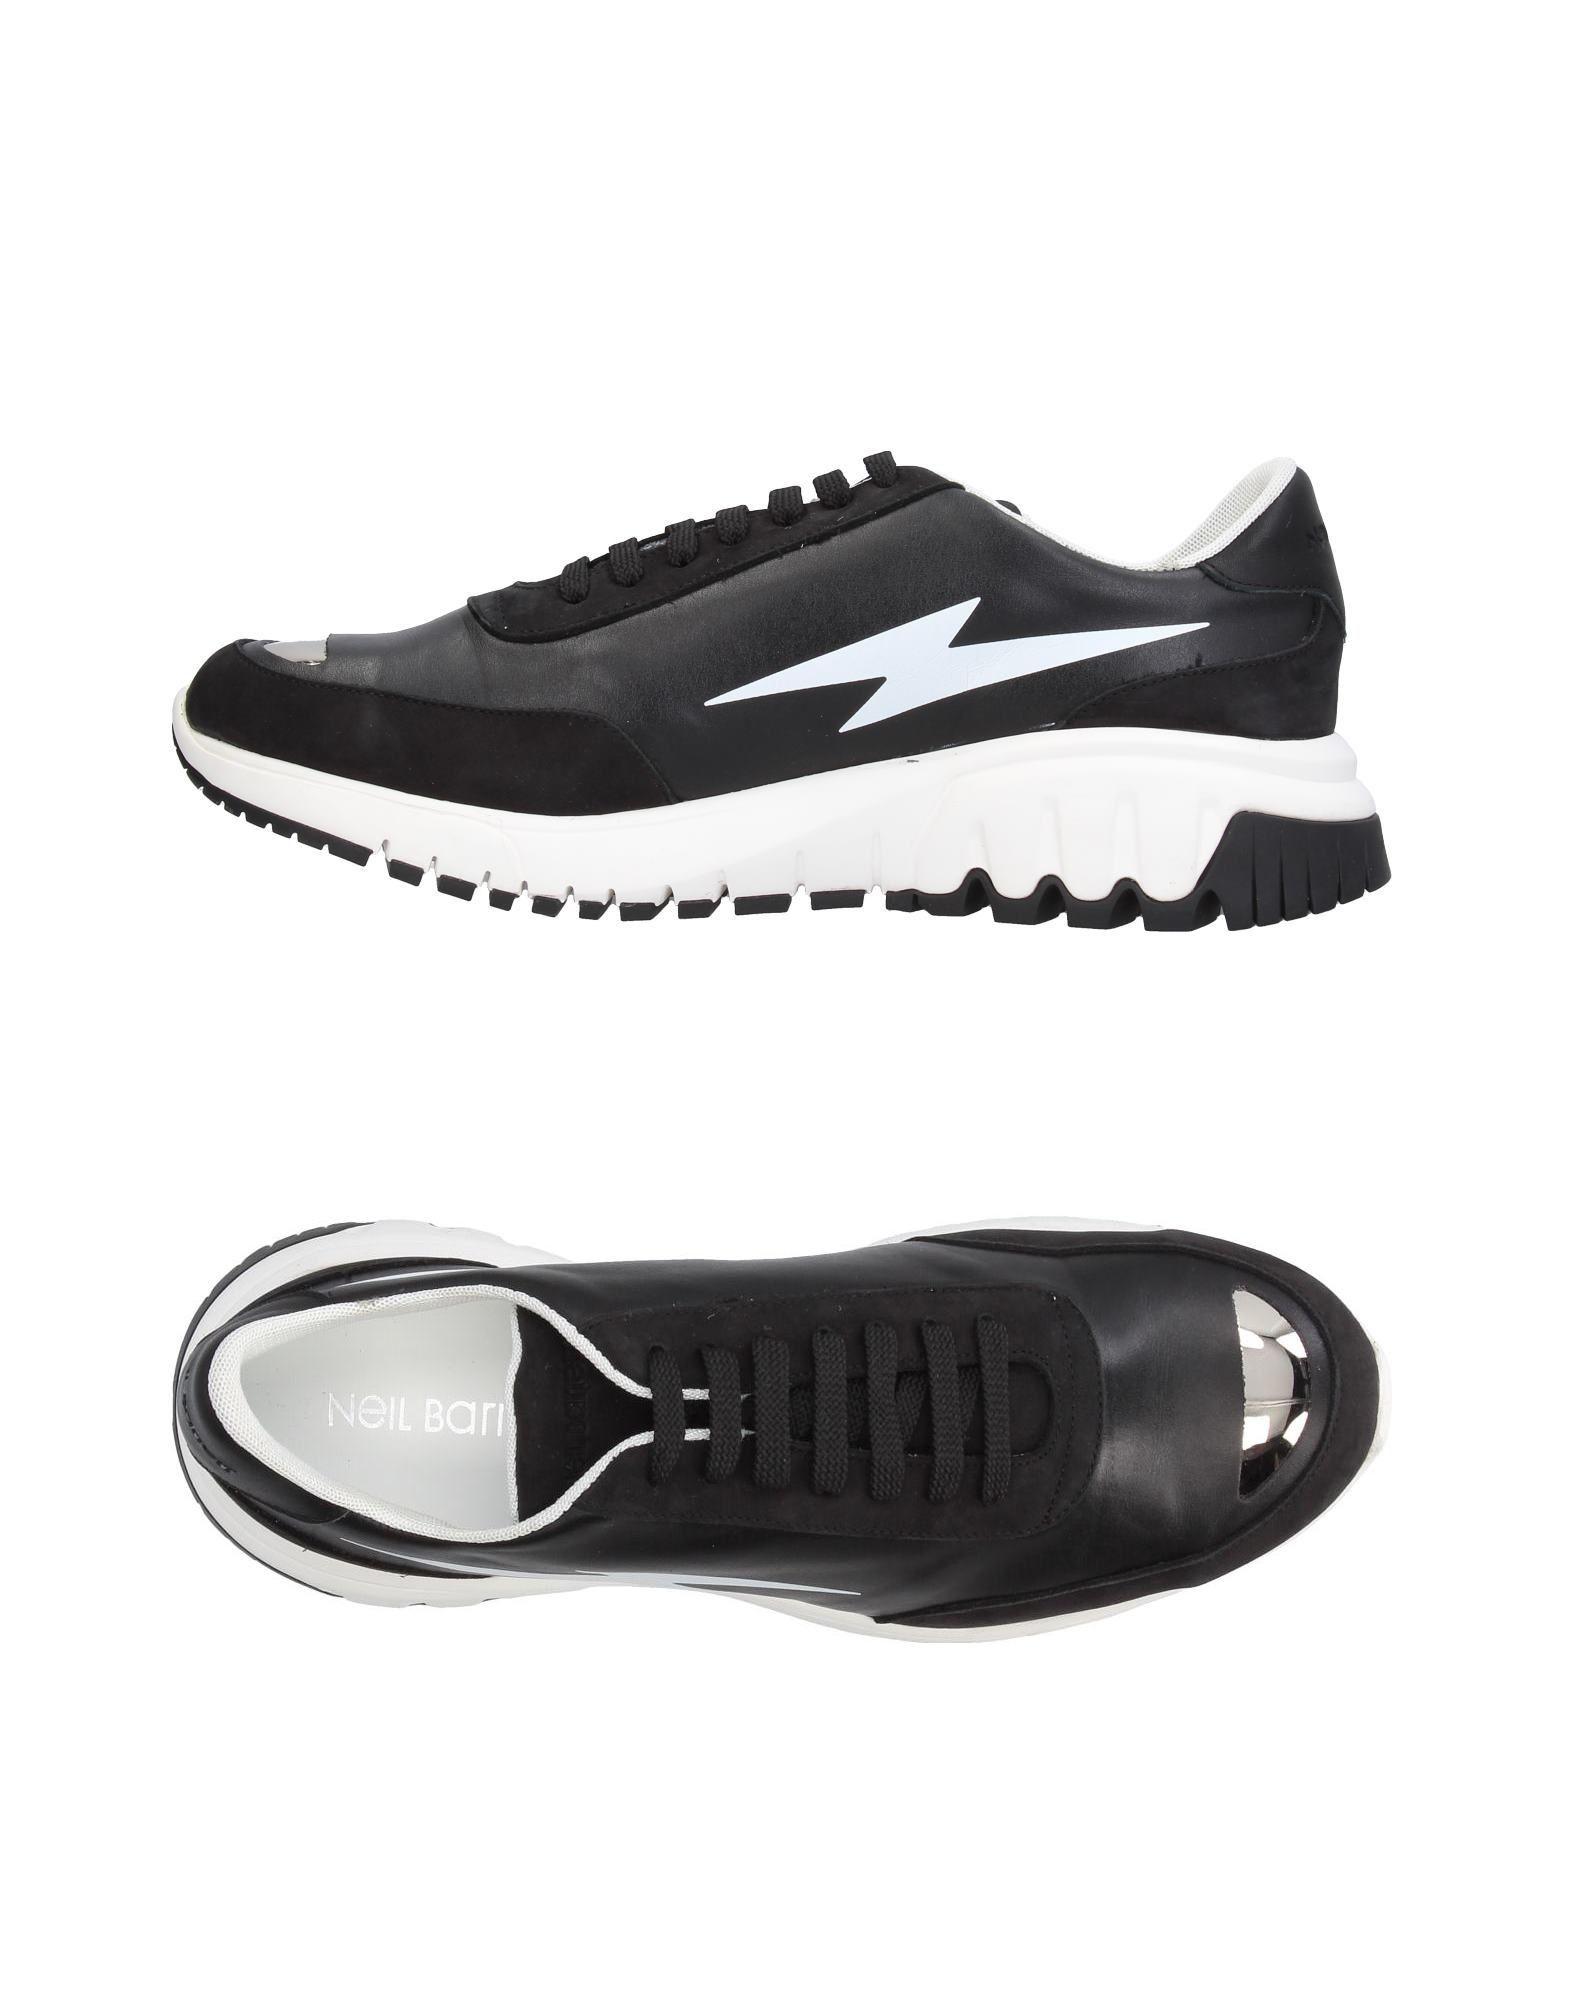 Neil Barrett Sneakers Herren  11392760XB Gute Qualität beliebte Schuhe